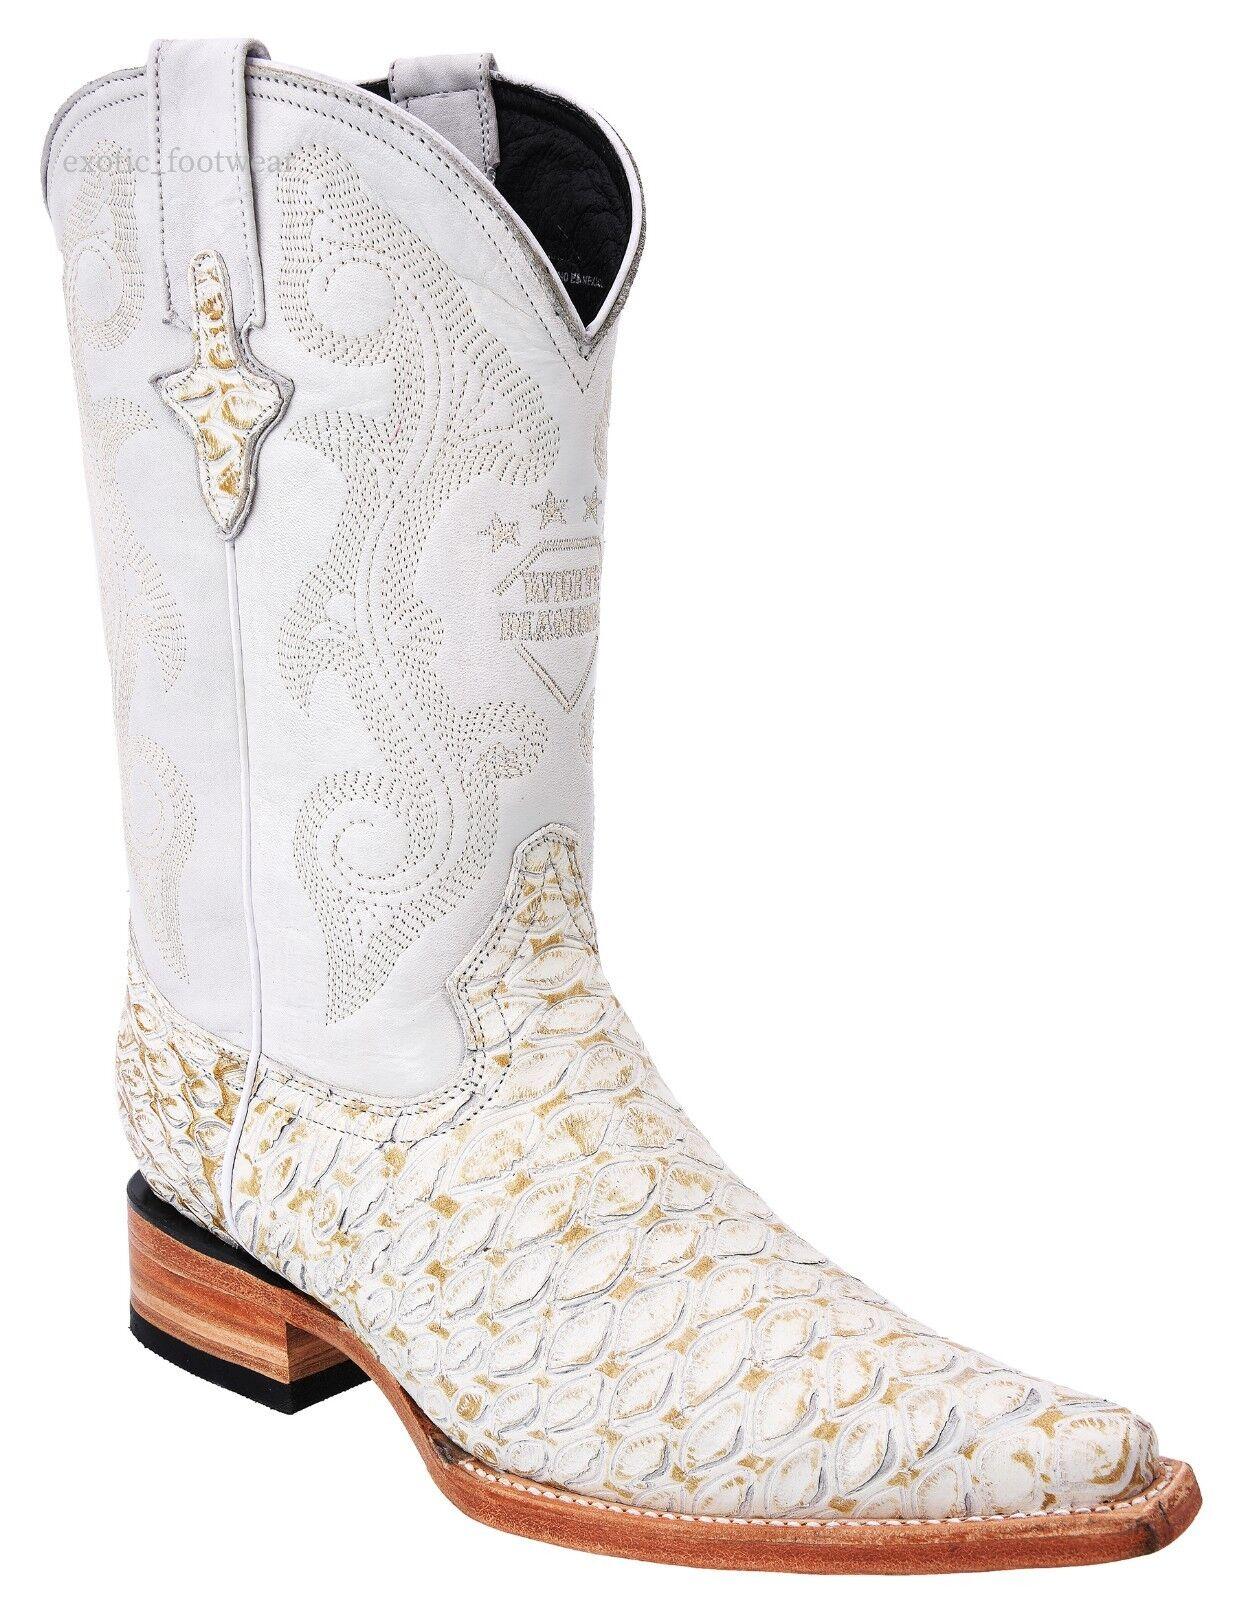 White Diamonds Men's Anteater Print Cowboy Boots 3X Pointy Toe Handmade